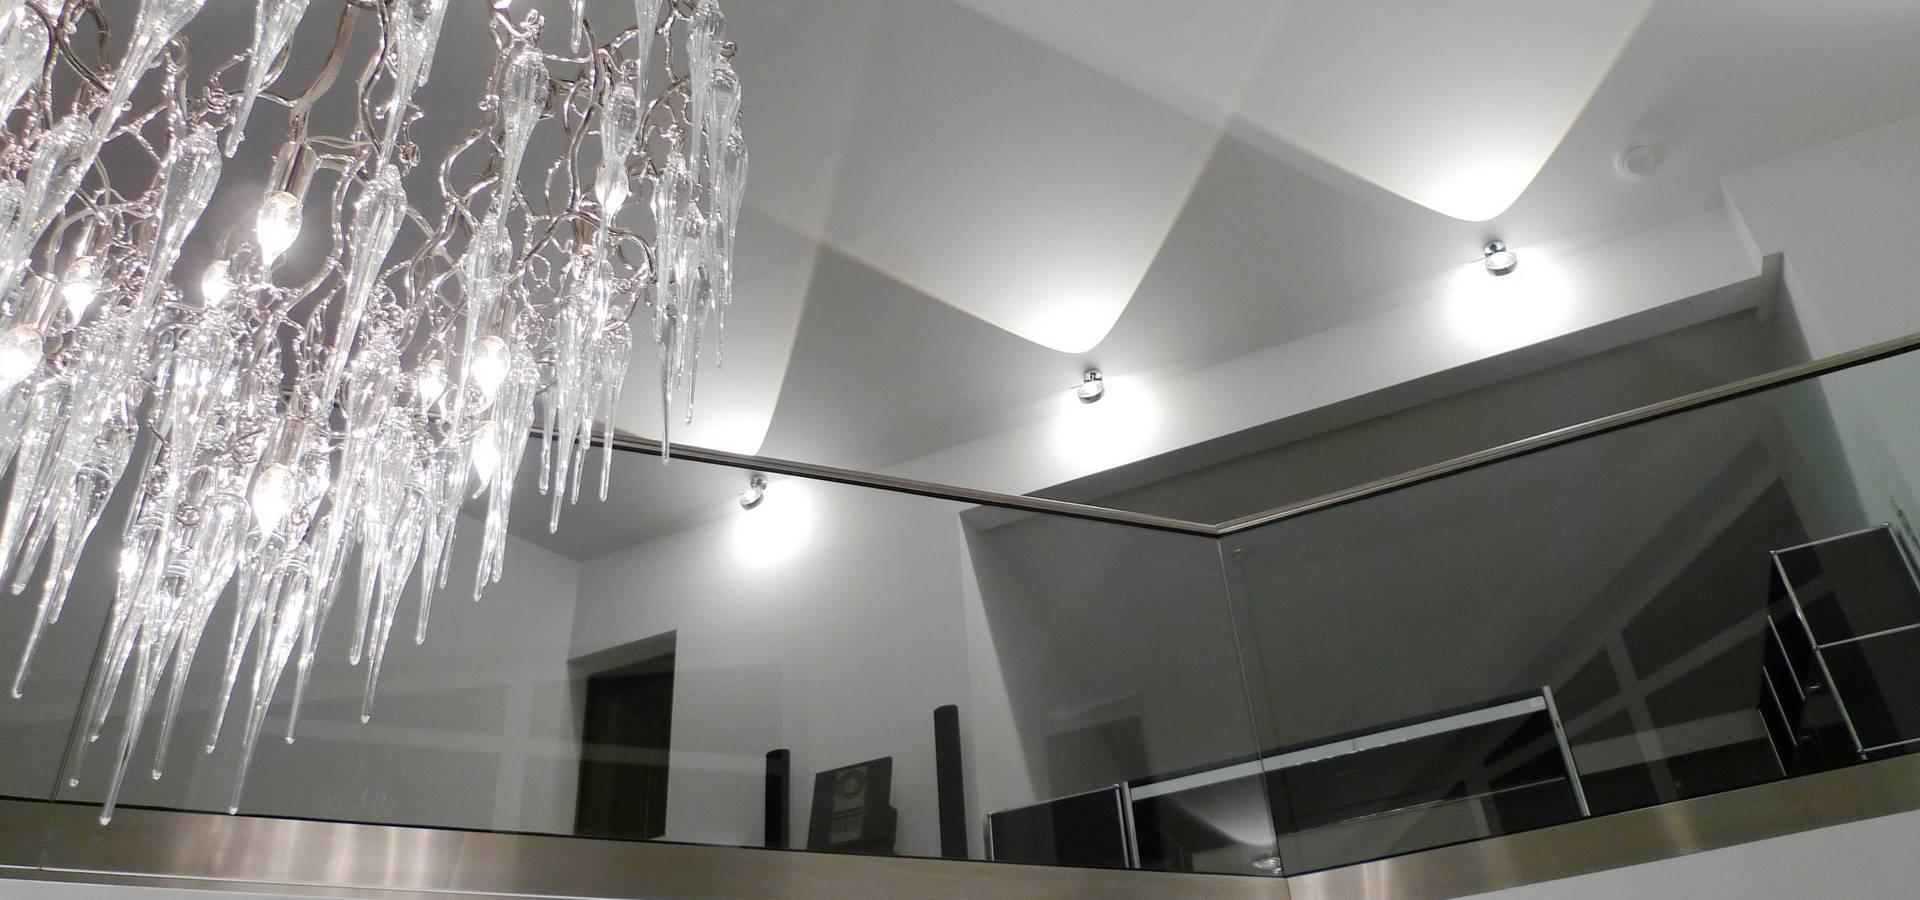 bolz licht design gmbh l mparas e iluminaci n en saarbr cken homify. Black Bedroom Furniture Sets. Home Design Ideas